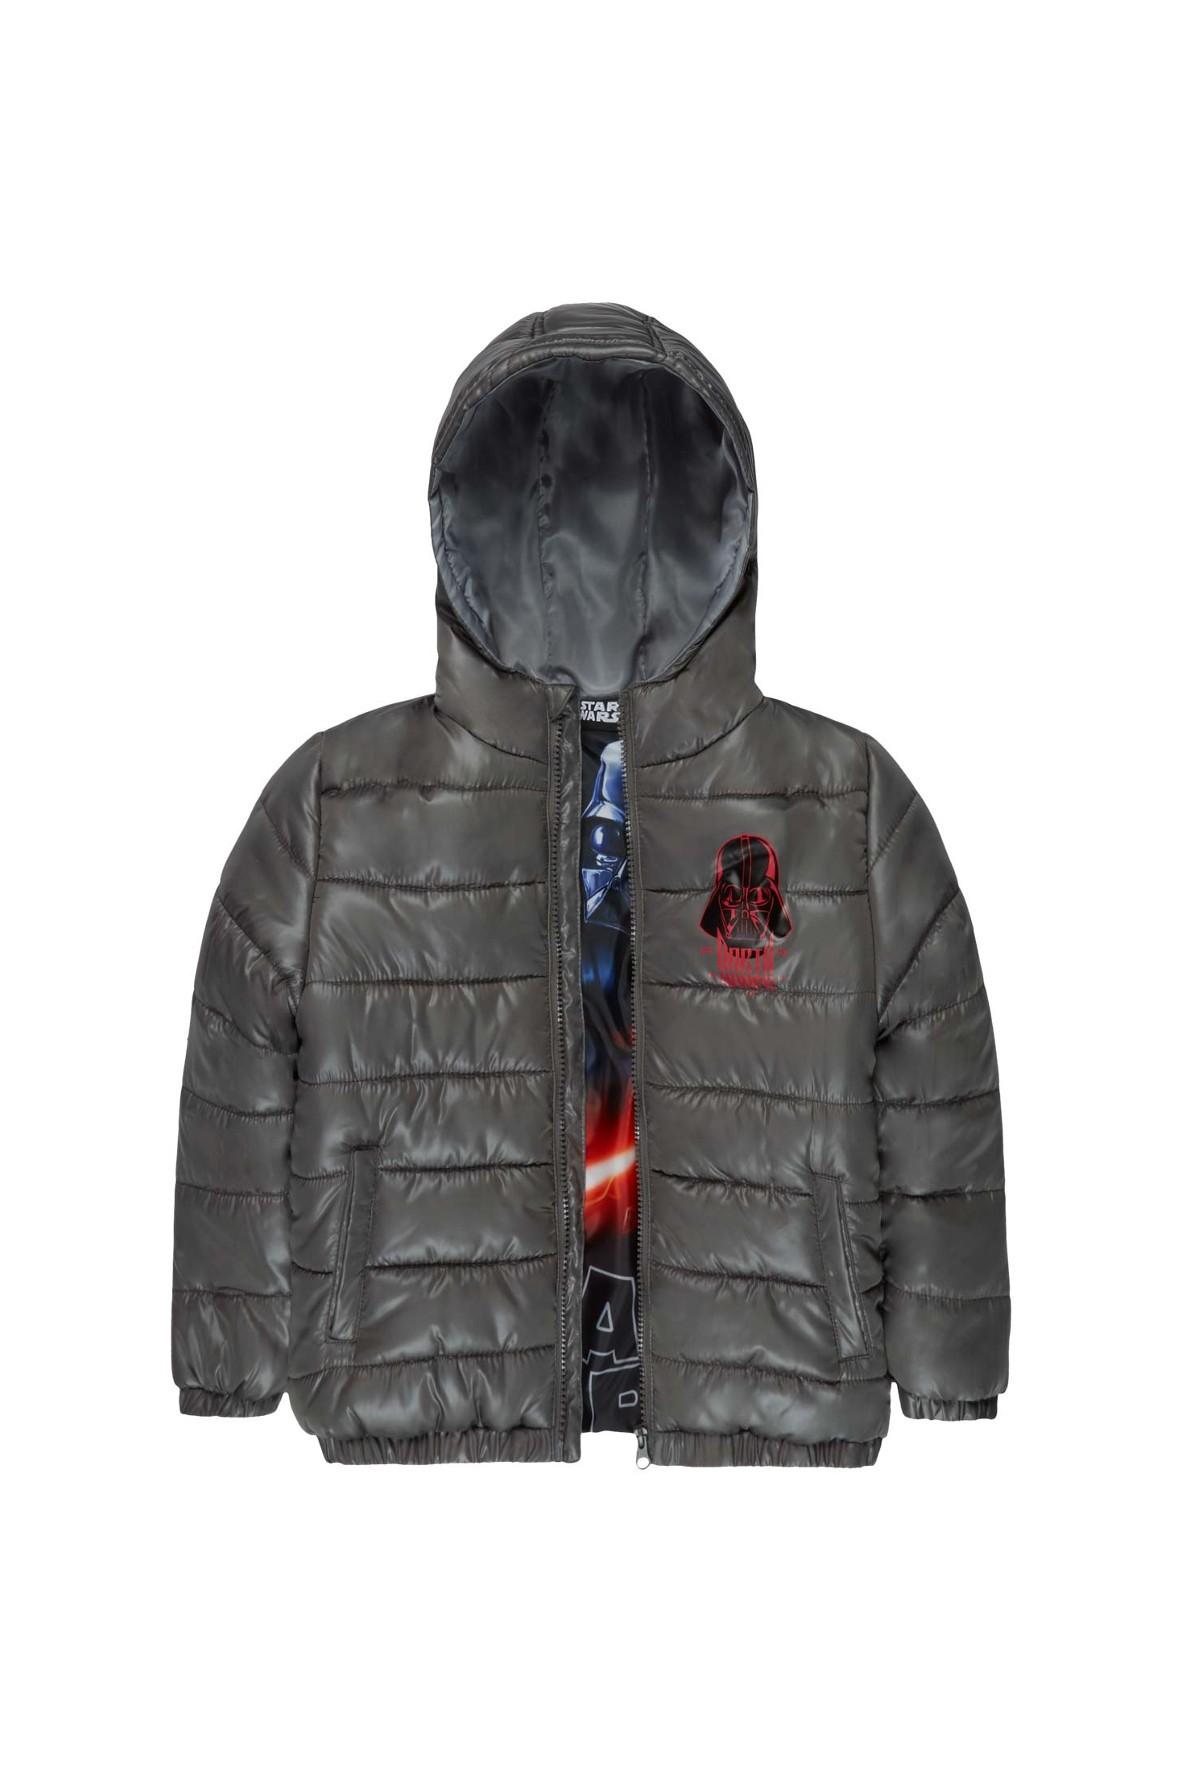 Kurtka chłopięca Star Wars 2A33A1